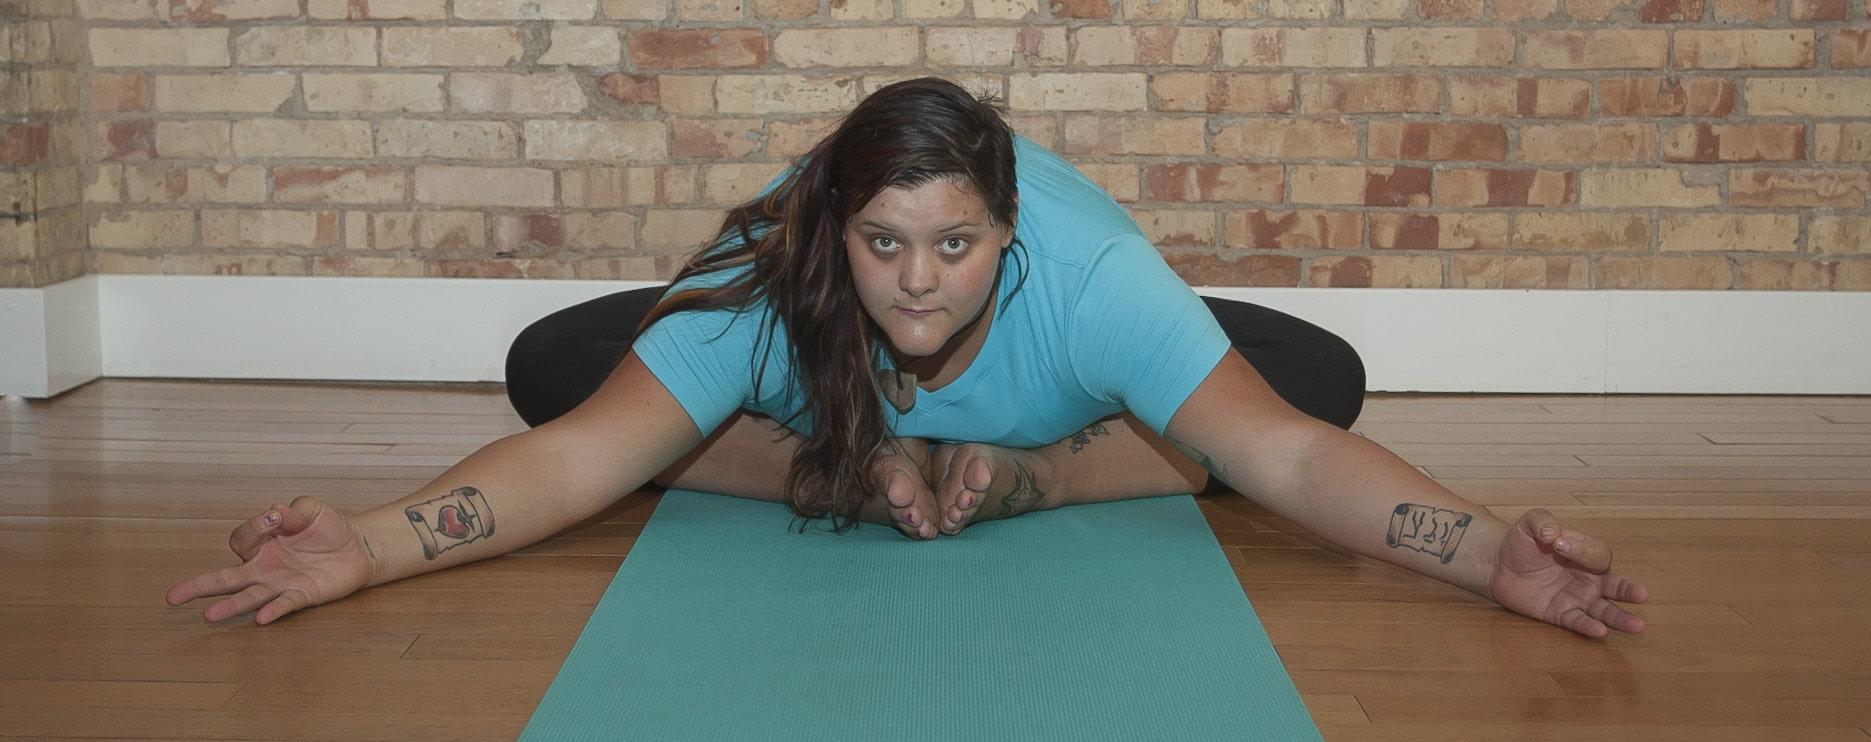 Body-image, beauty & bravery: A Just B Yoga photo shoot